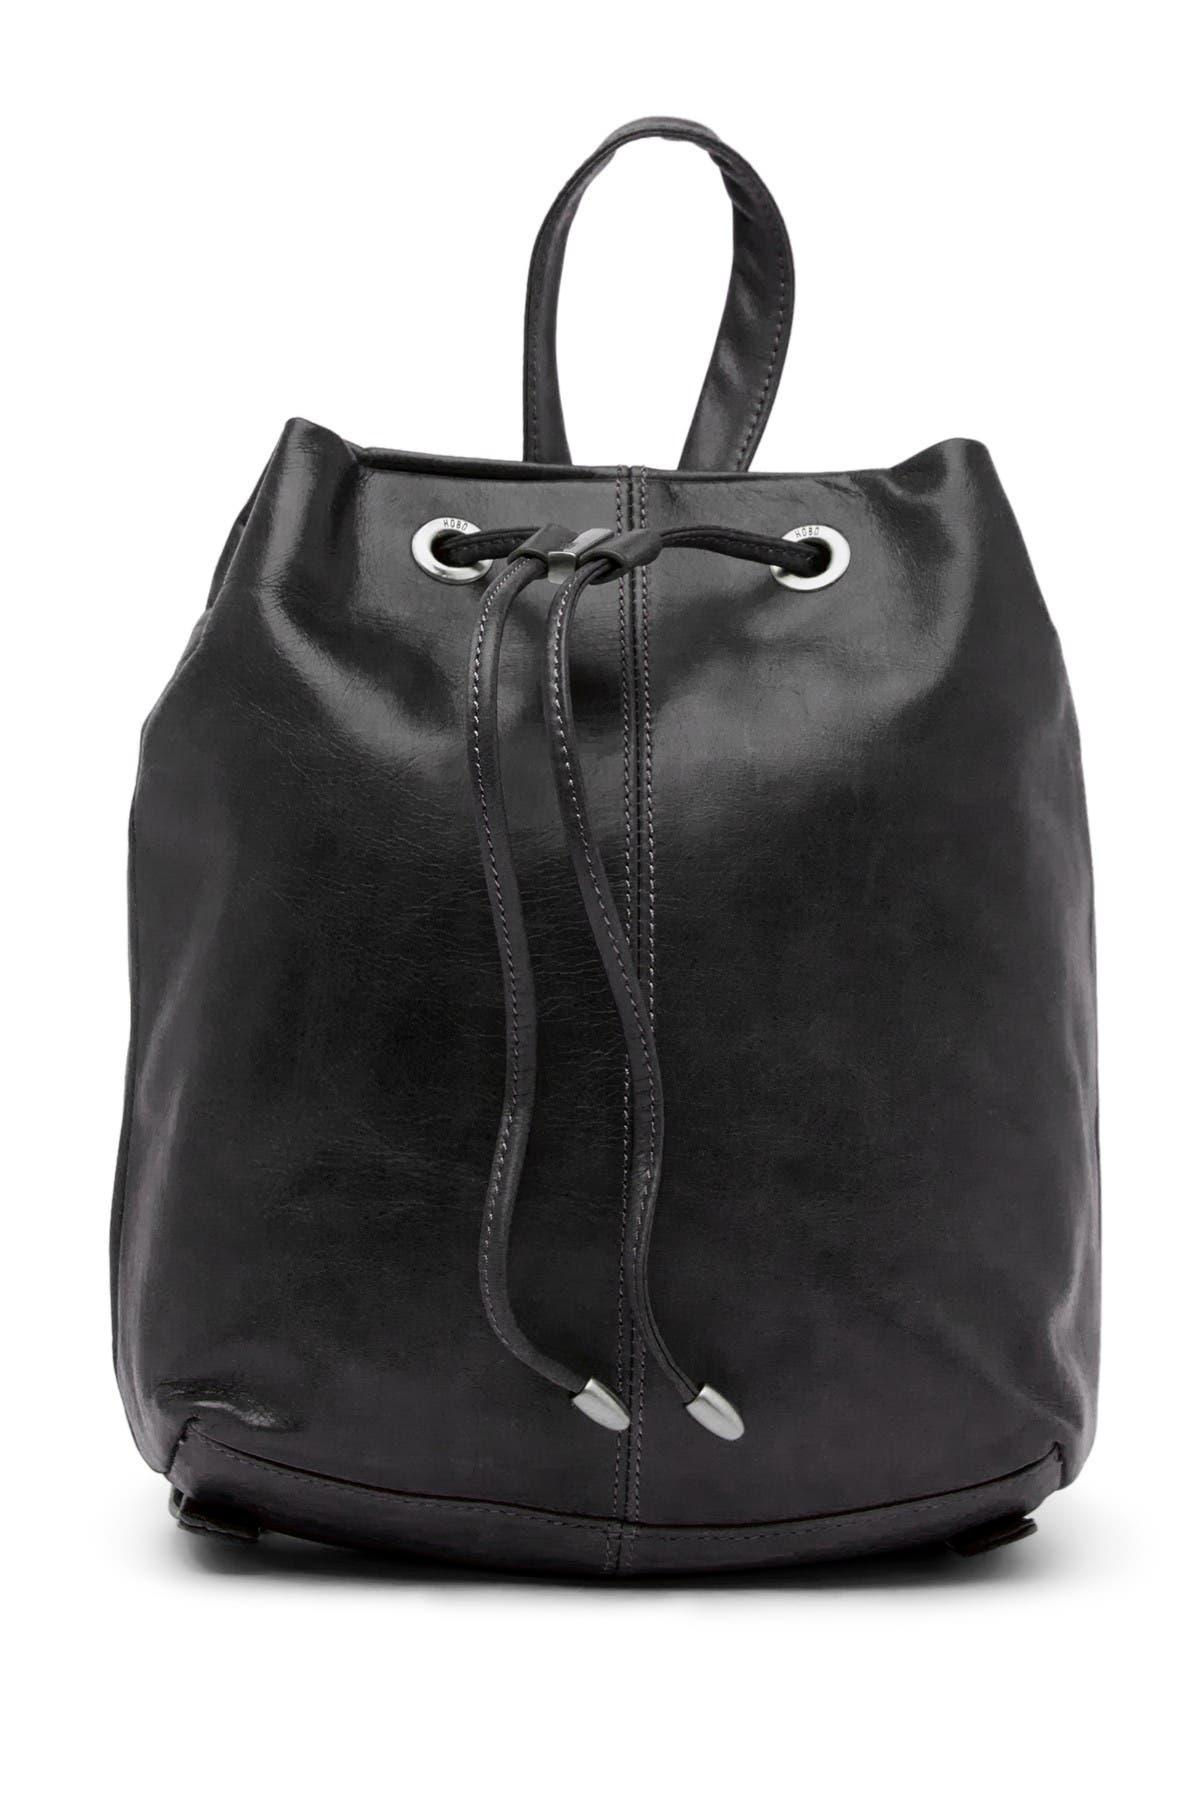 Image of Hobo Kendall Leather Backpack